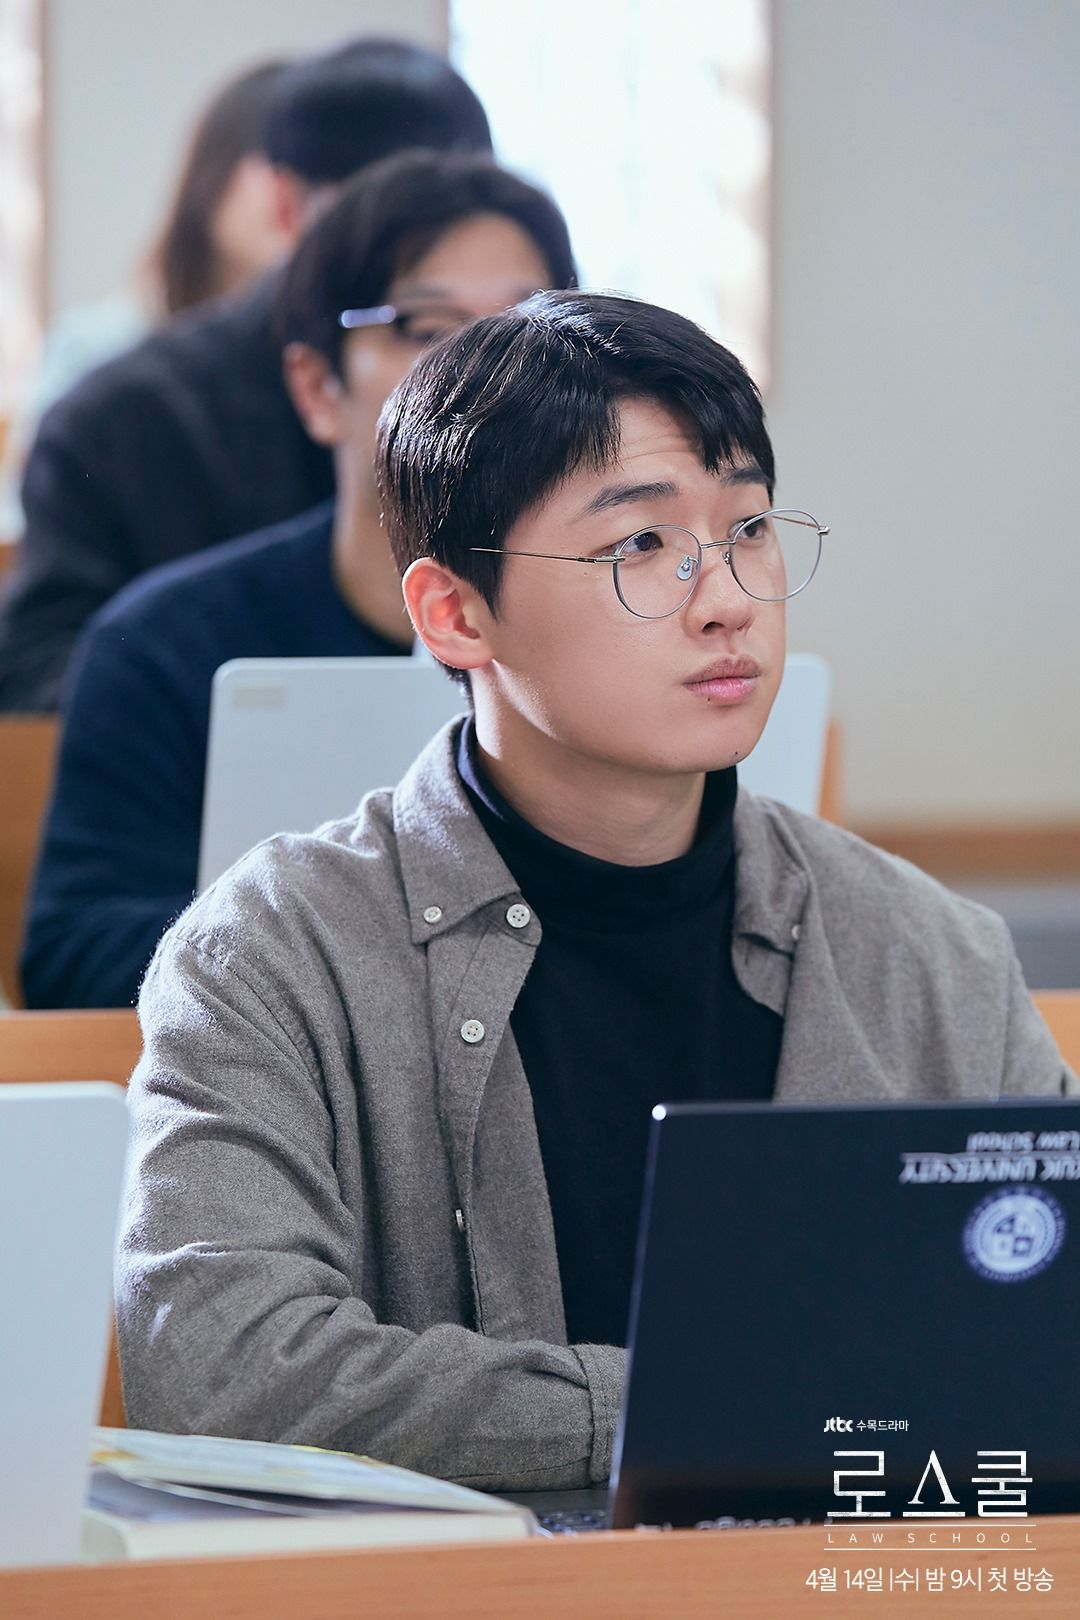 pemain Law School, David Lee